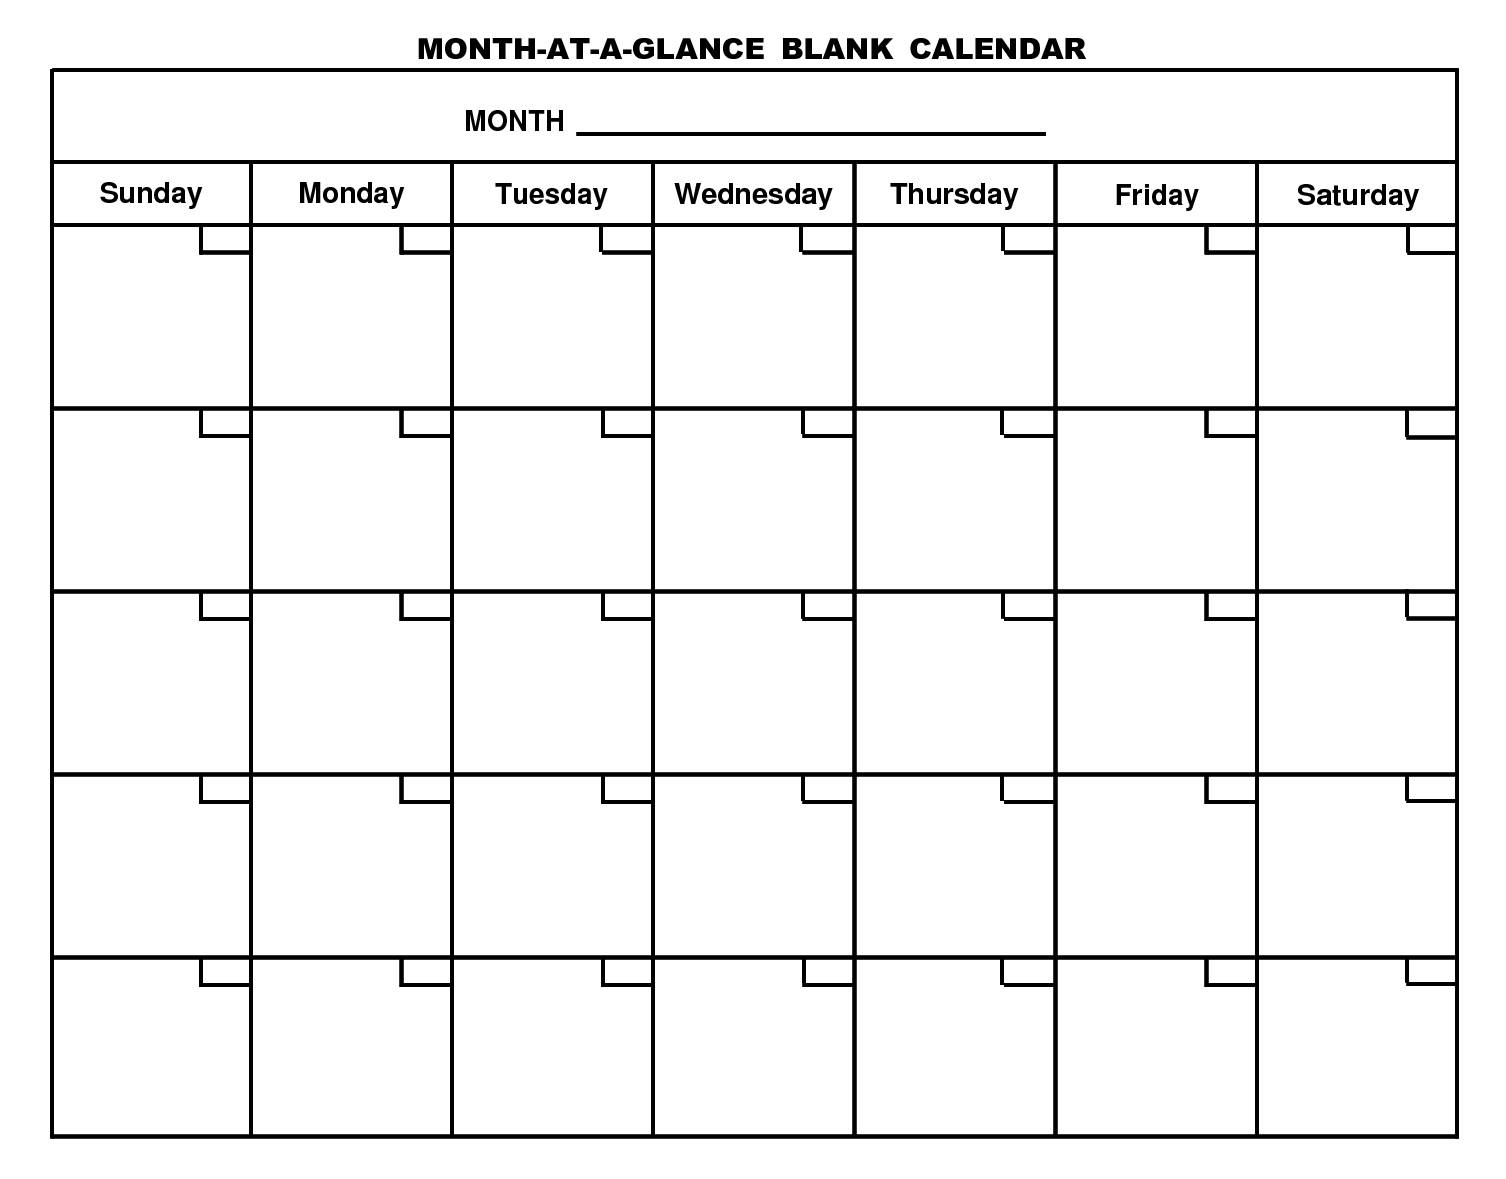 Monthly Calendar Schedule Template